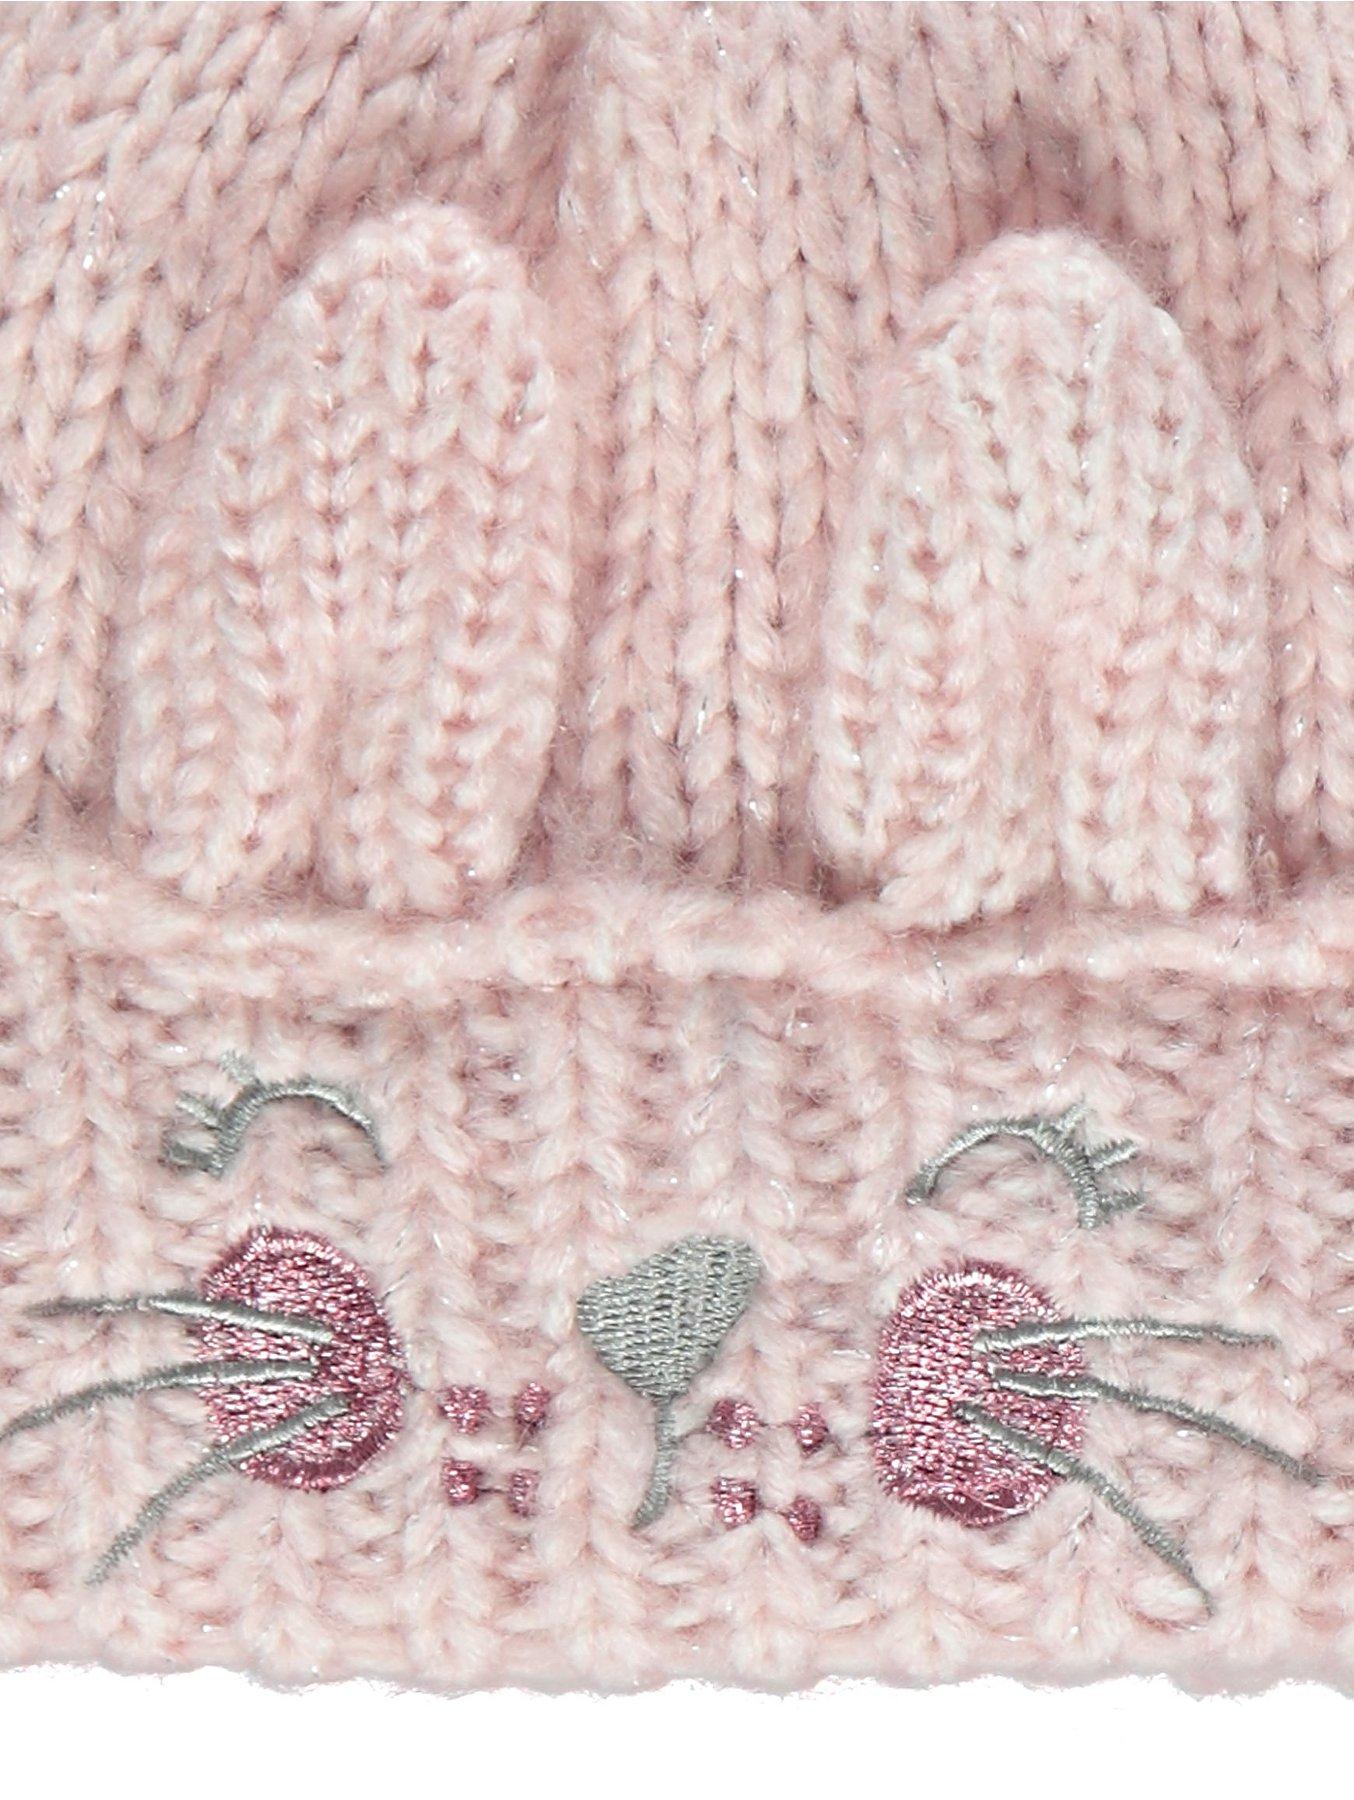 Pink Sparkling Bunny Bobble Hat. Reset 8524c3ffec94